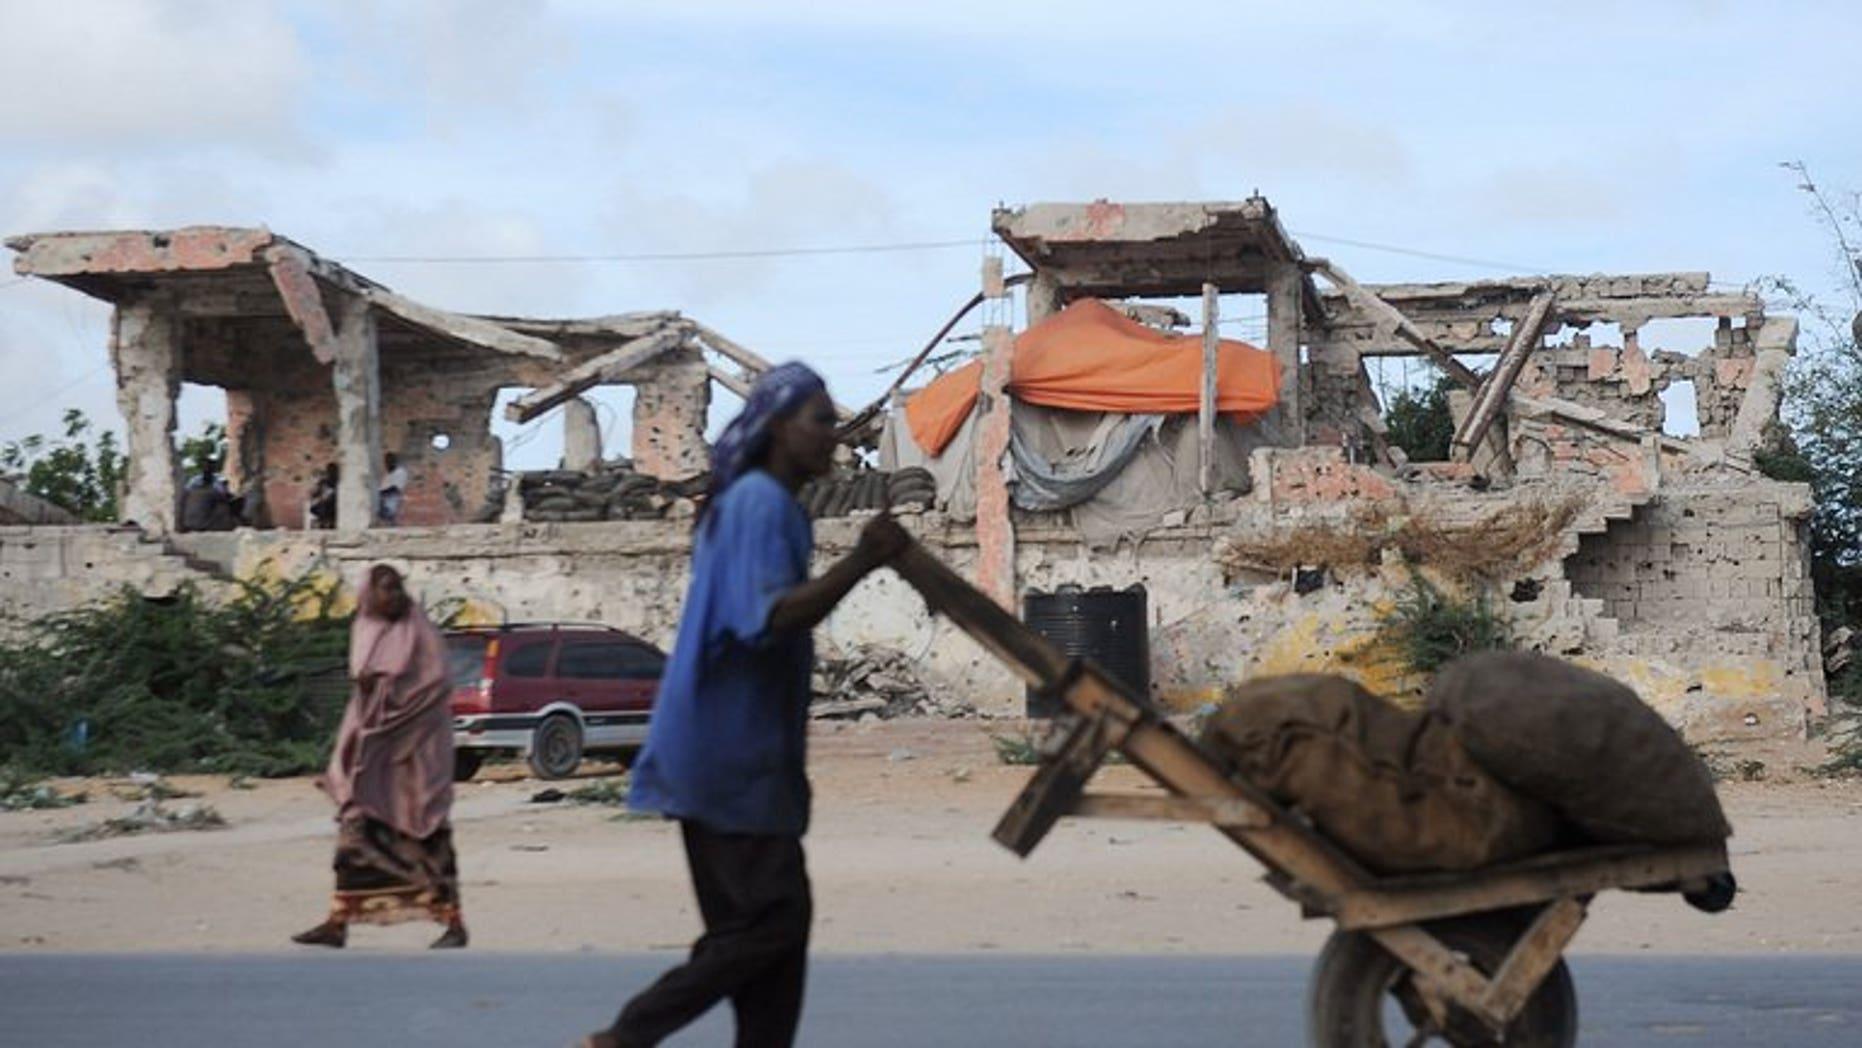 A man carts sacks of charcoal in Mogadishu on April 23, 2013.